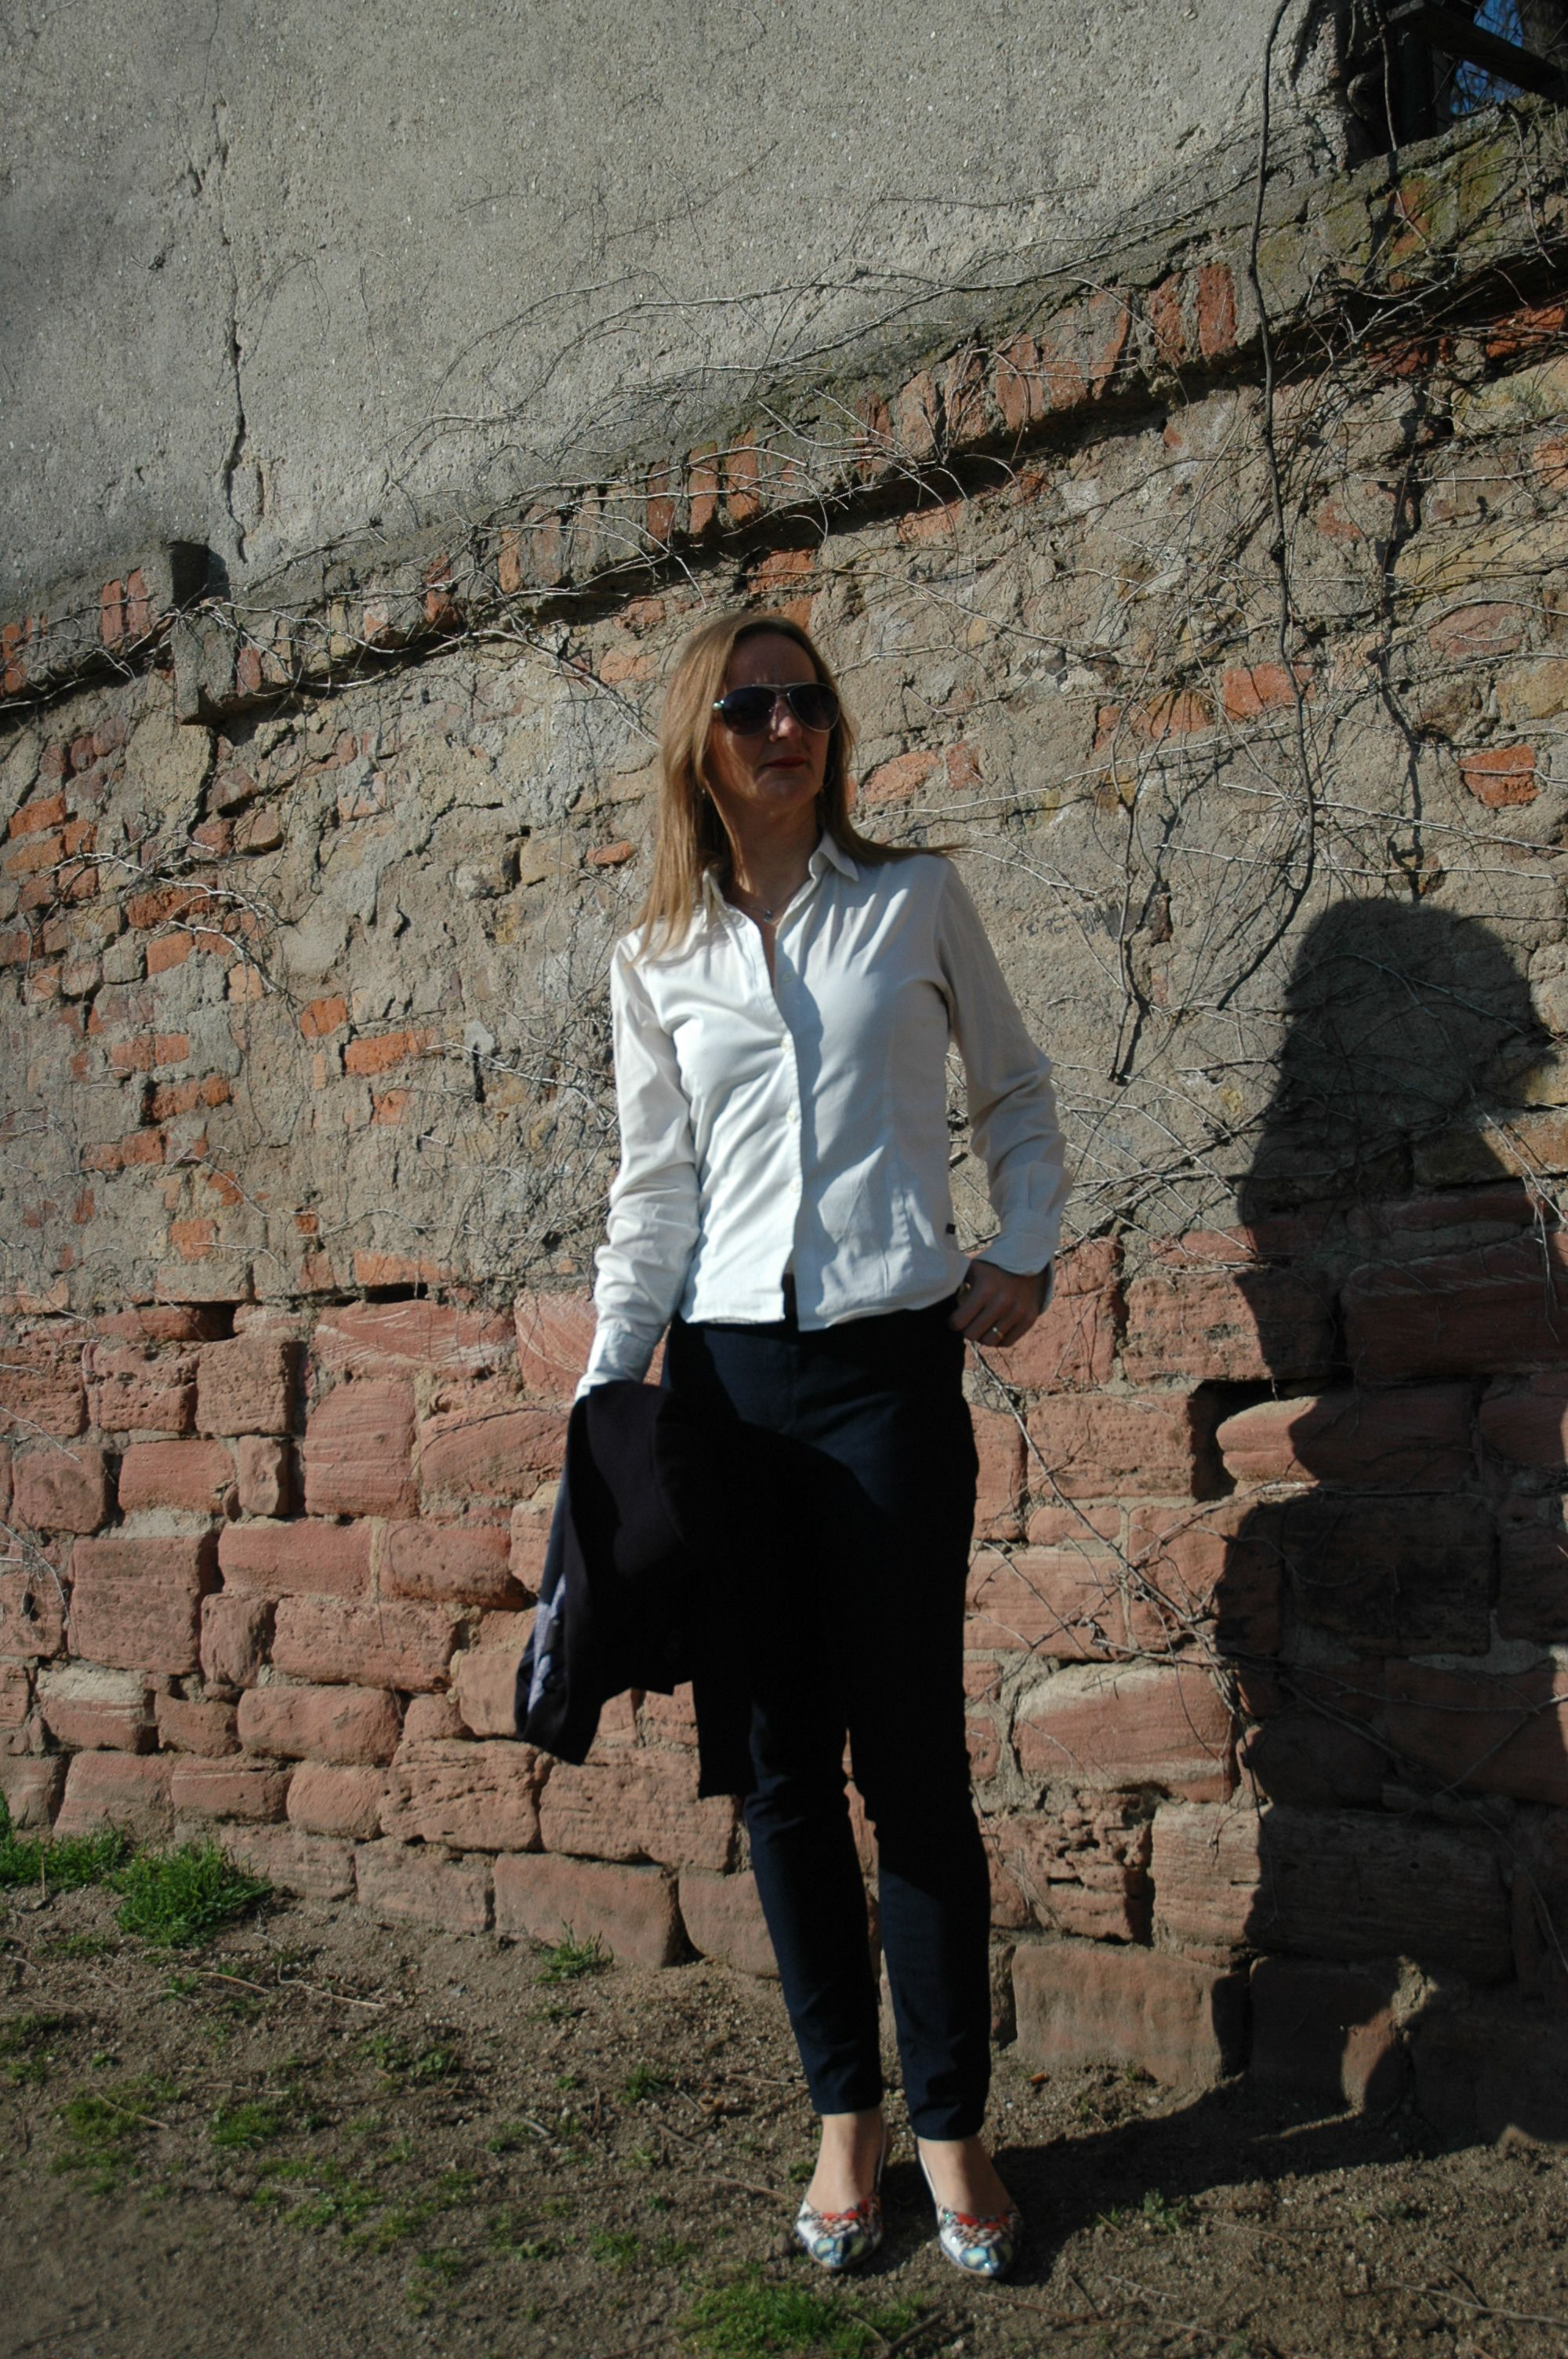 #casual #elegance Oceanblue Style  40+ fashion blog #white blouse #navy blazer